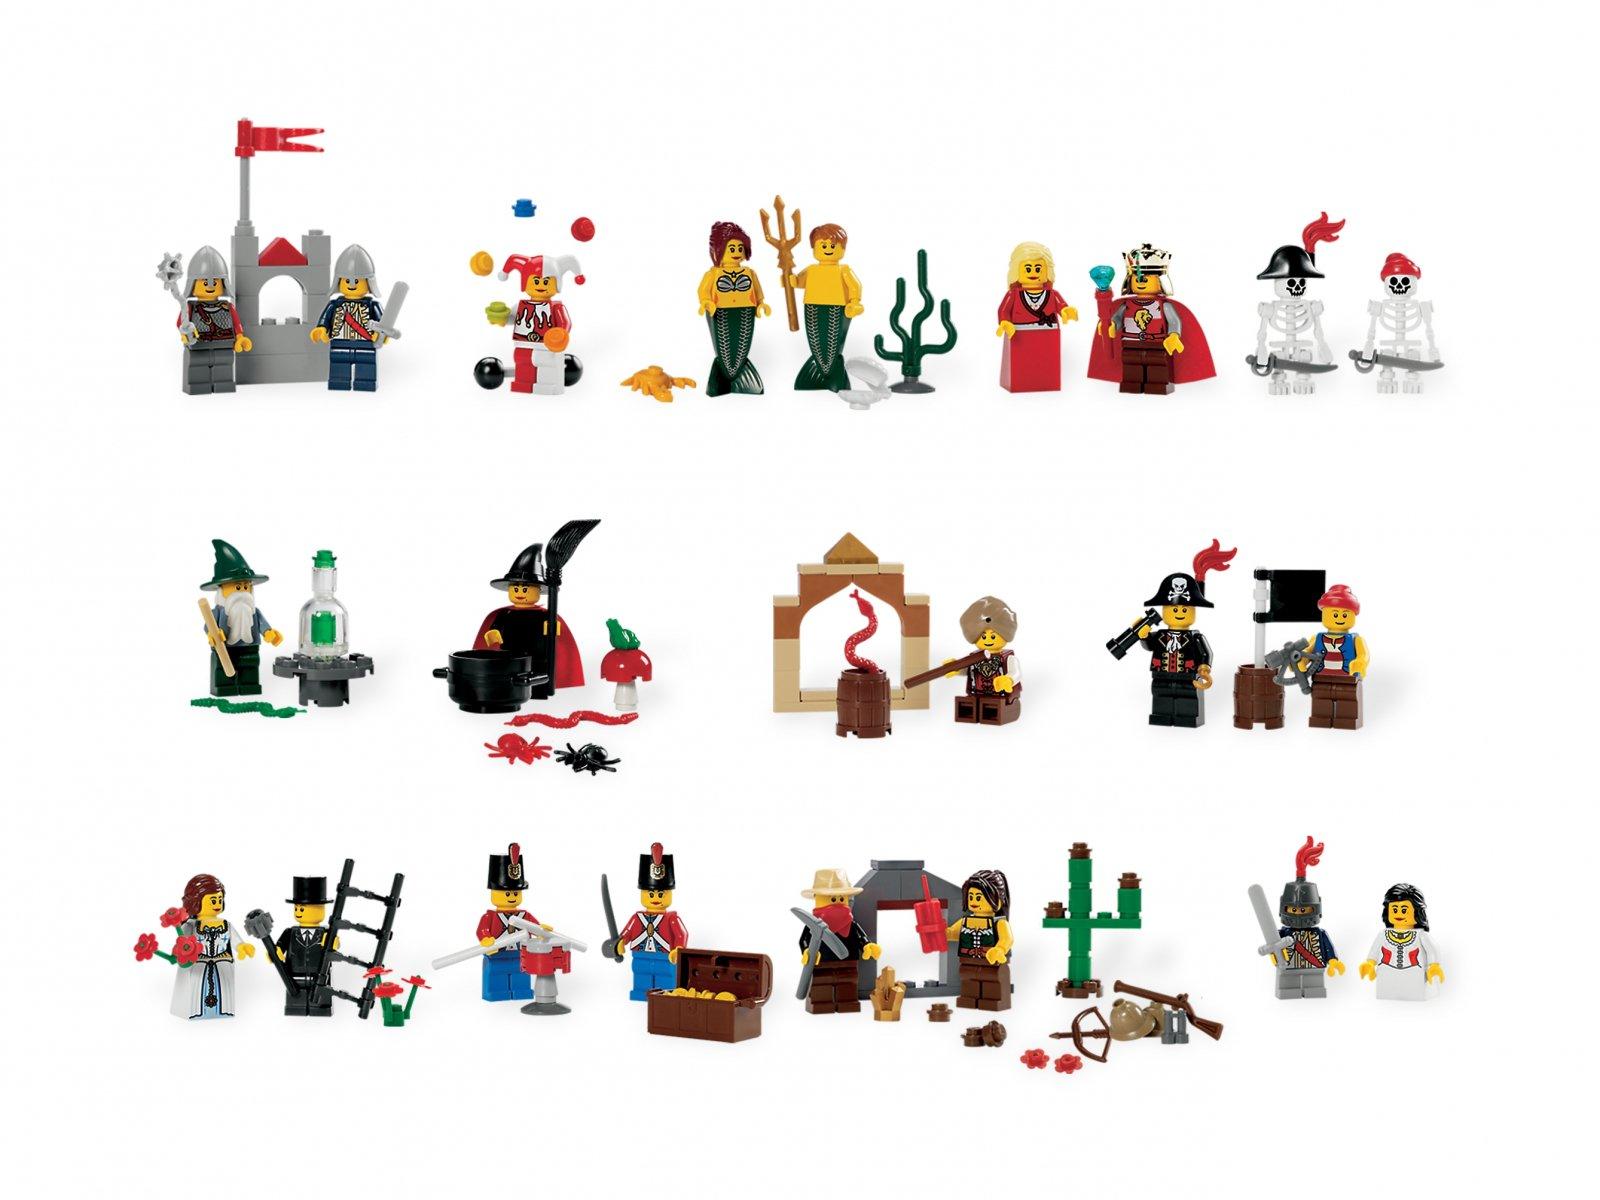 LEGO Education Fairytale and Historic Minifigure Set 9349